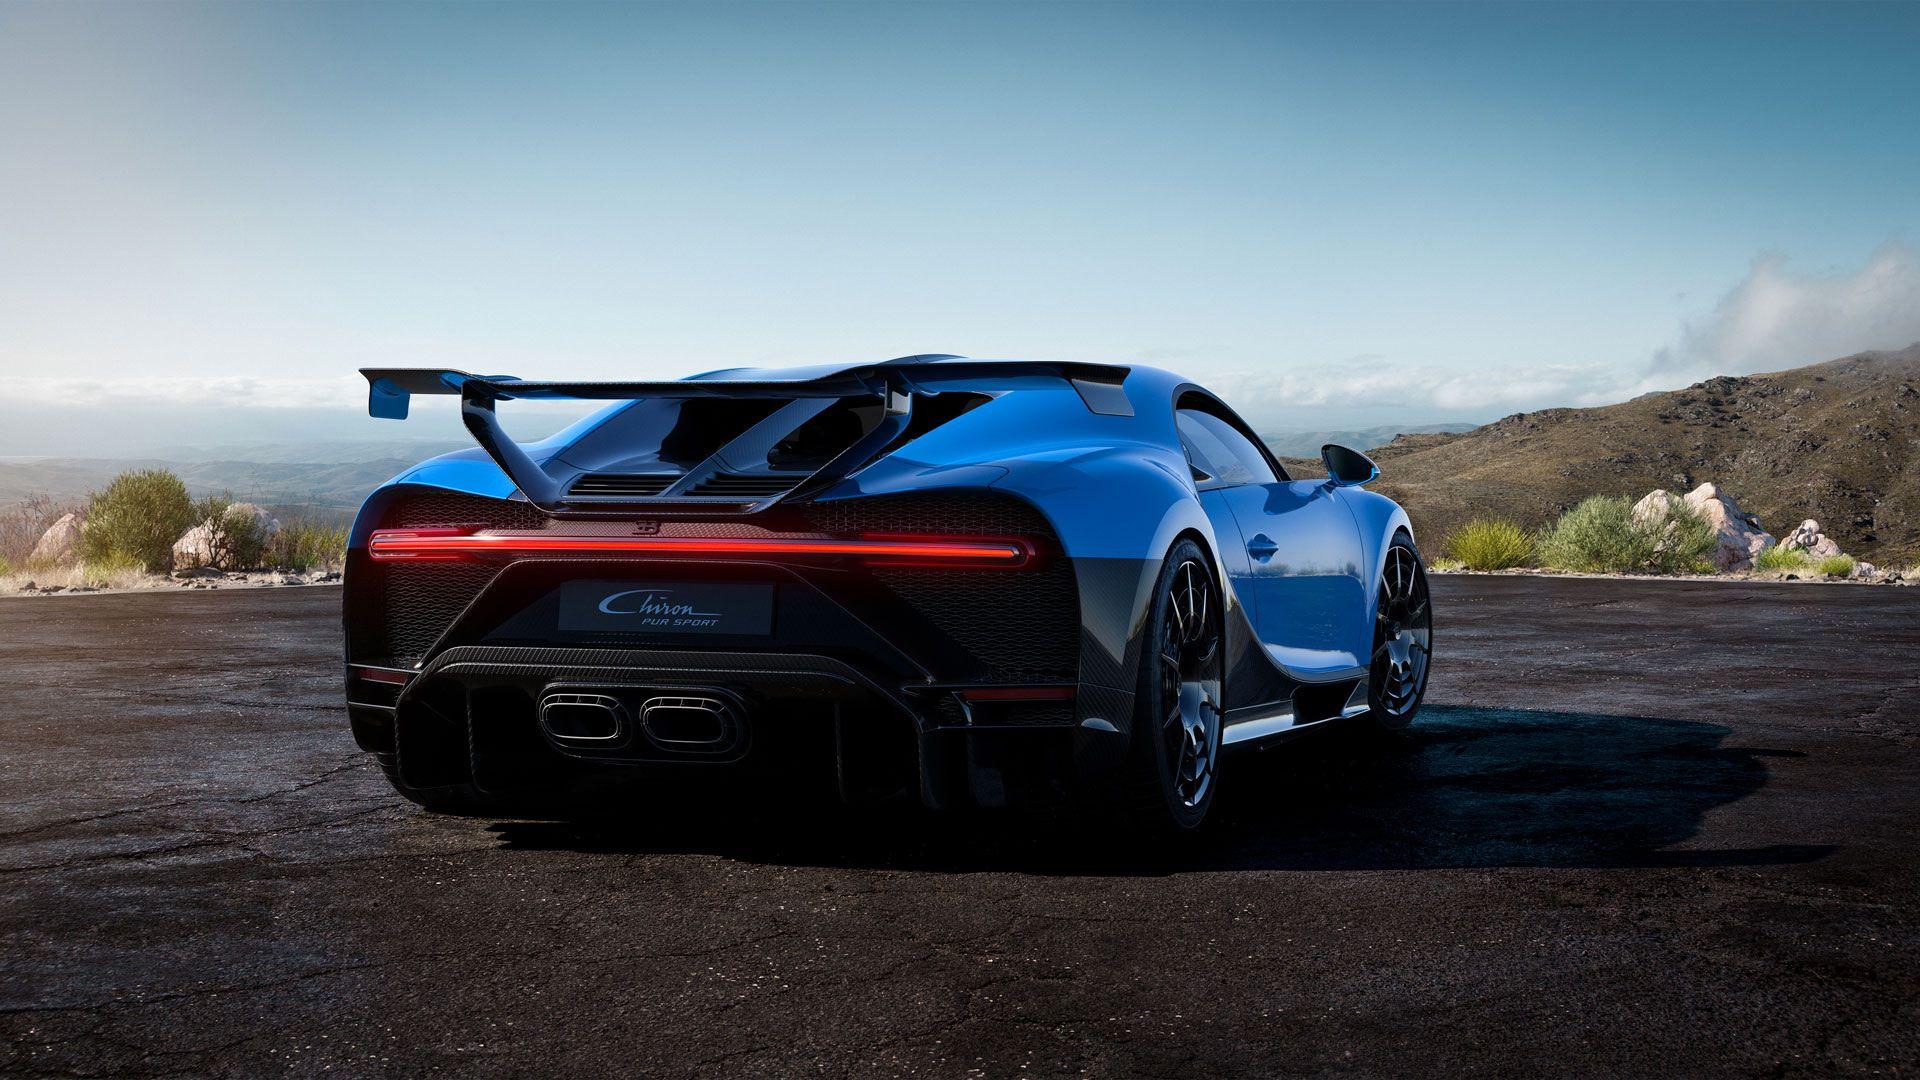 bugatti-chiron-pur-sport-dynamic-4